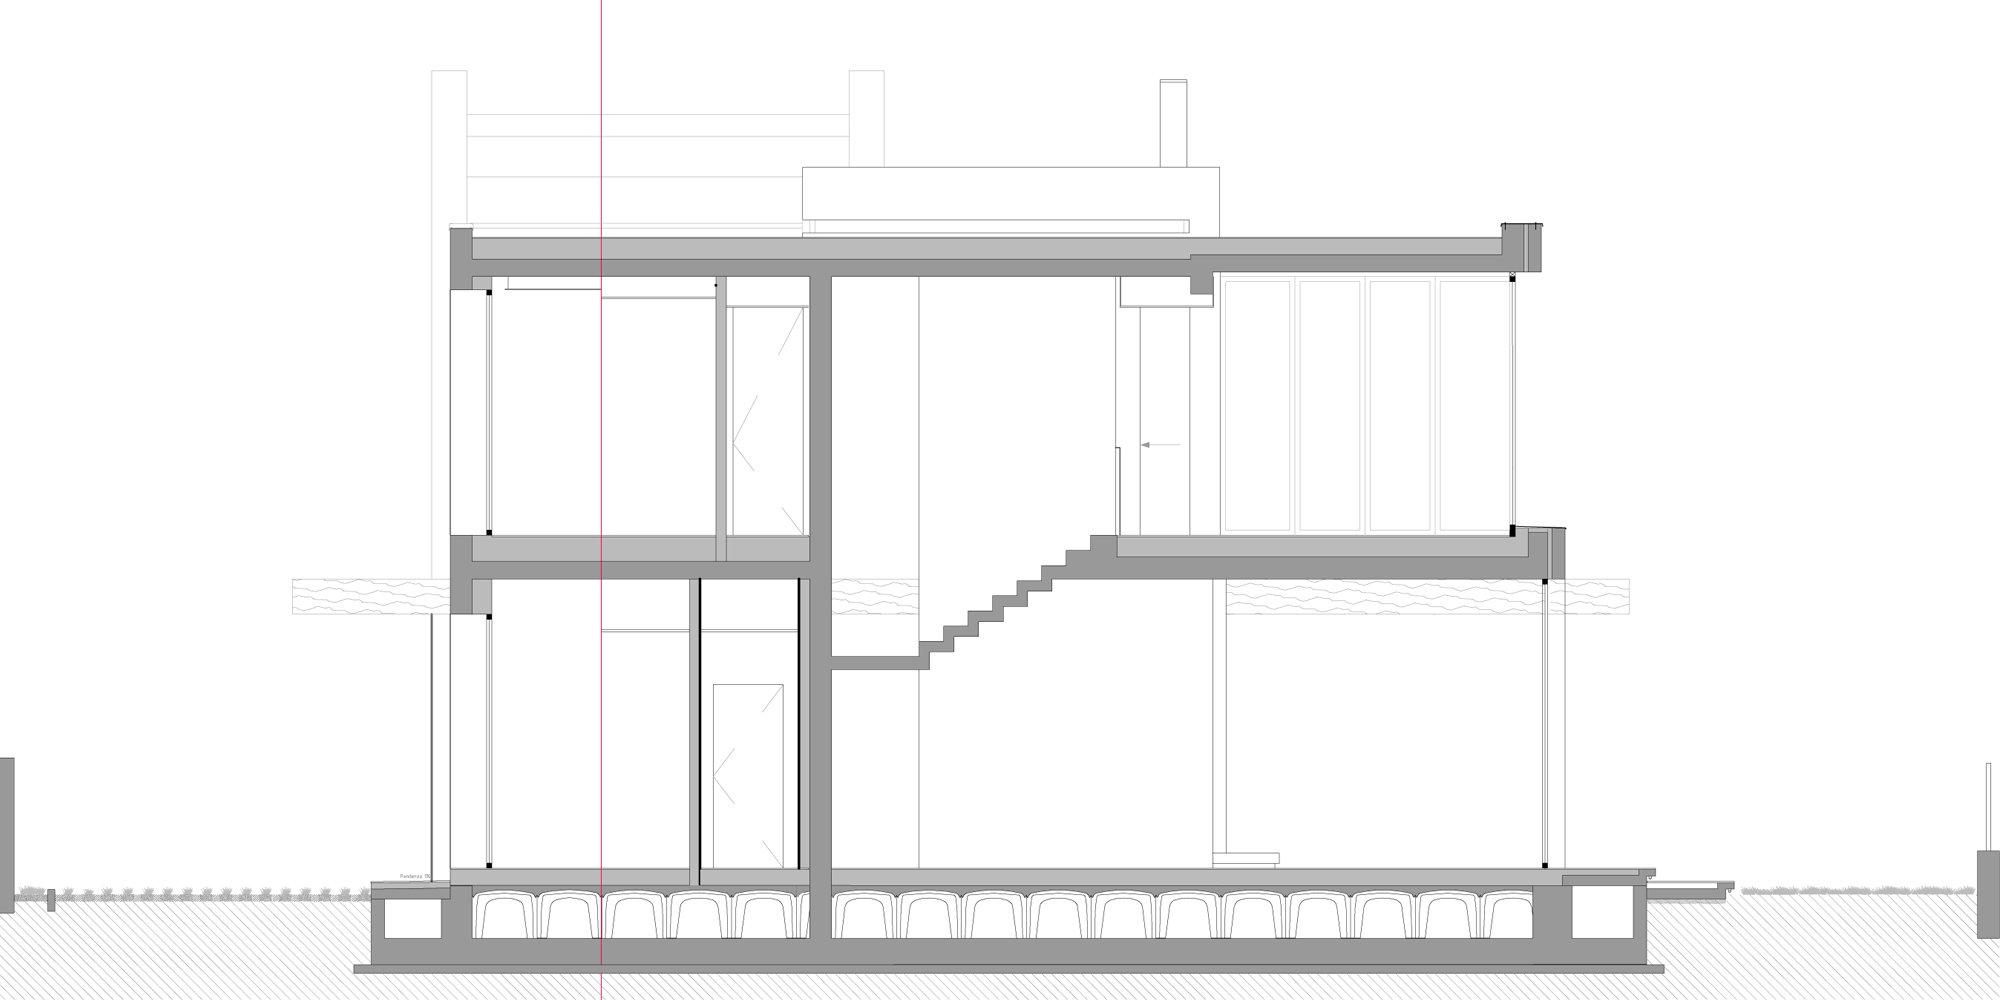 Sezione AA © Giraldi Associati Architetti